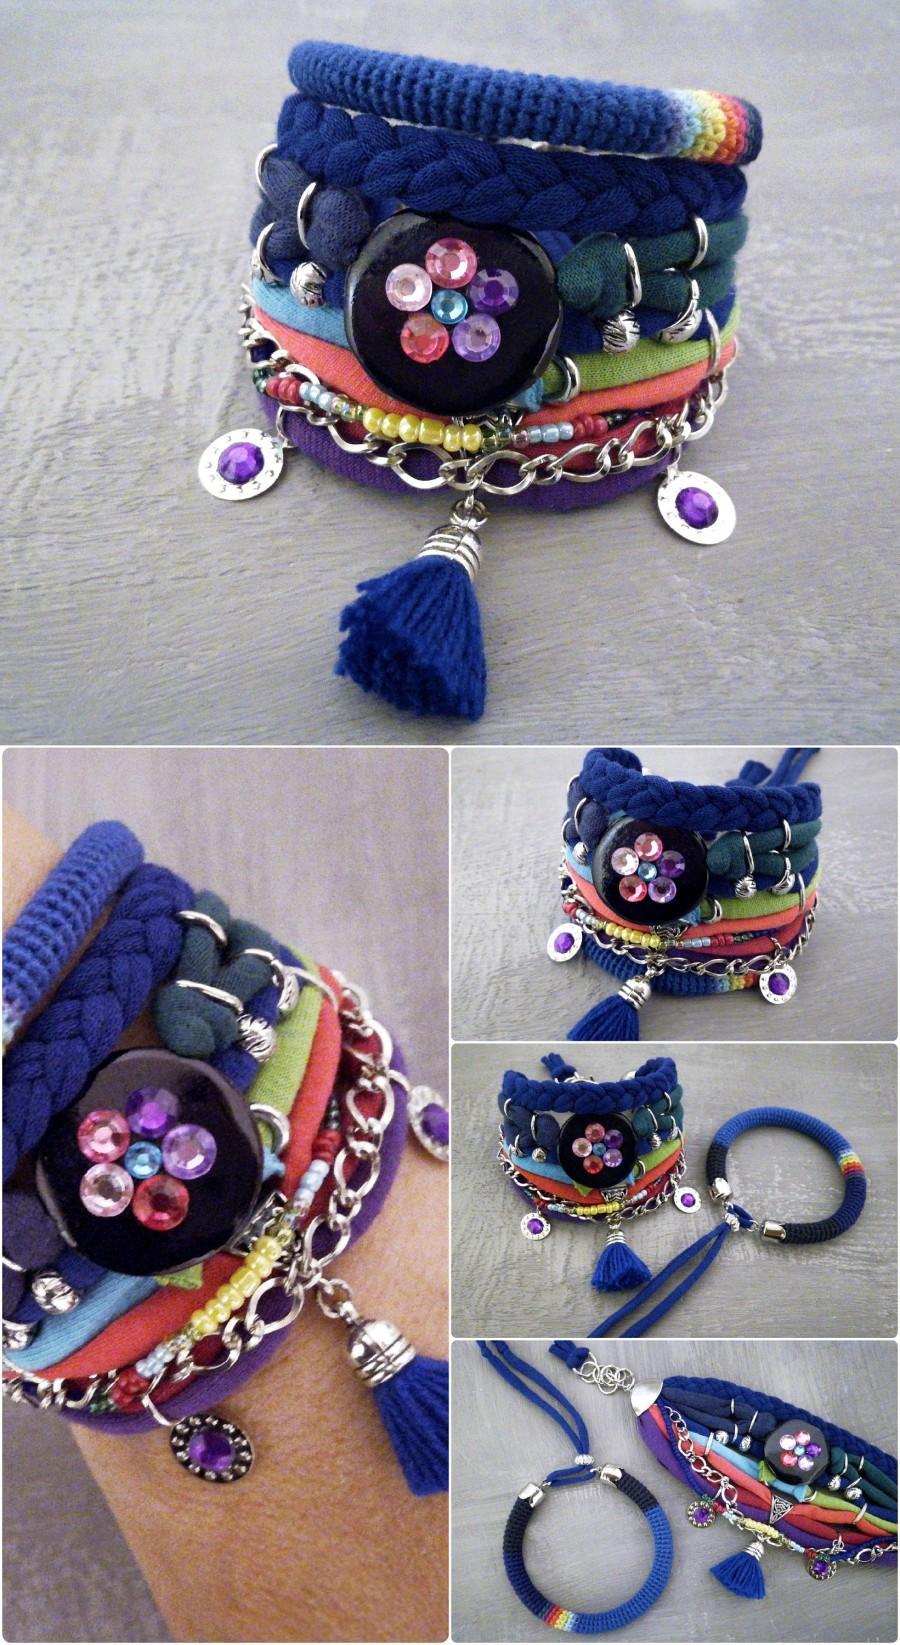 Düğün - Bohemian Bracelet Aurora Borealis, Bohemian Jewelry Jersey Bracelet, Crochet Bracelet, Galaxy Boho Bracelet Set Northern Lights